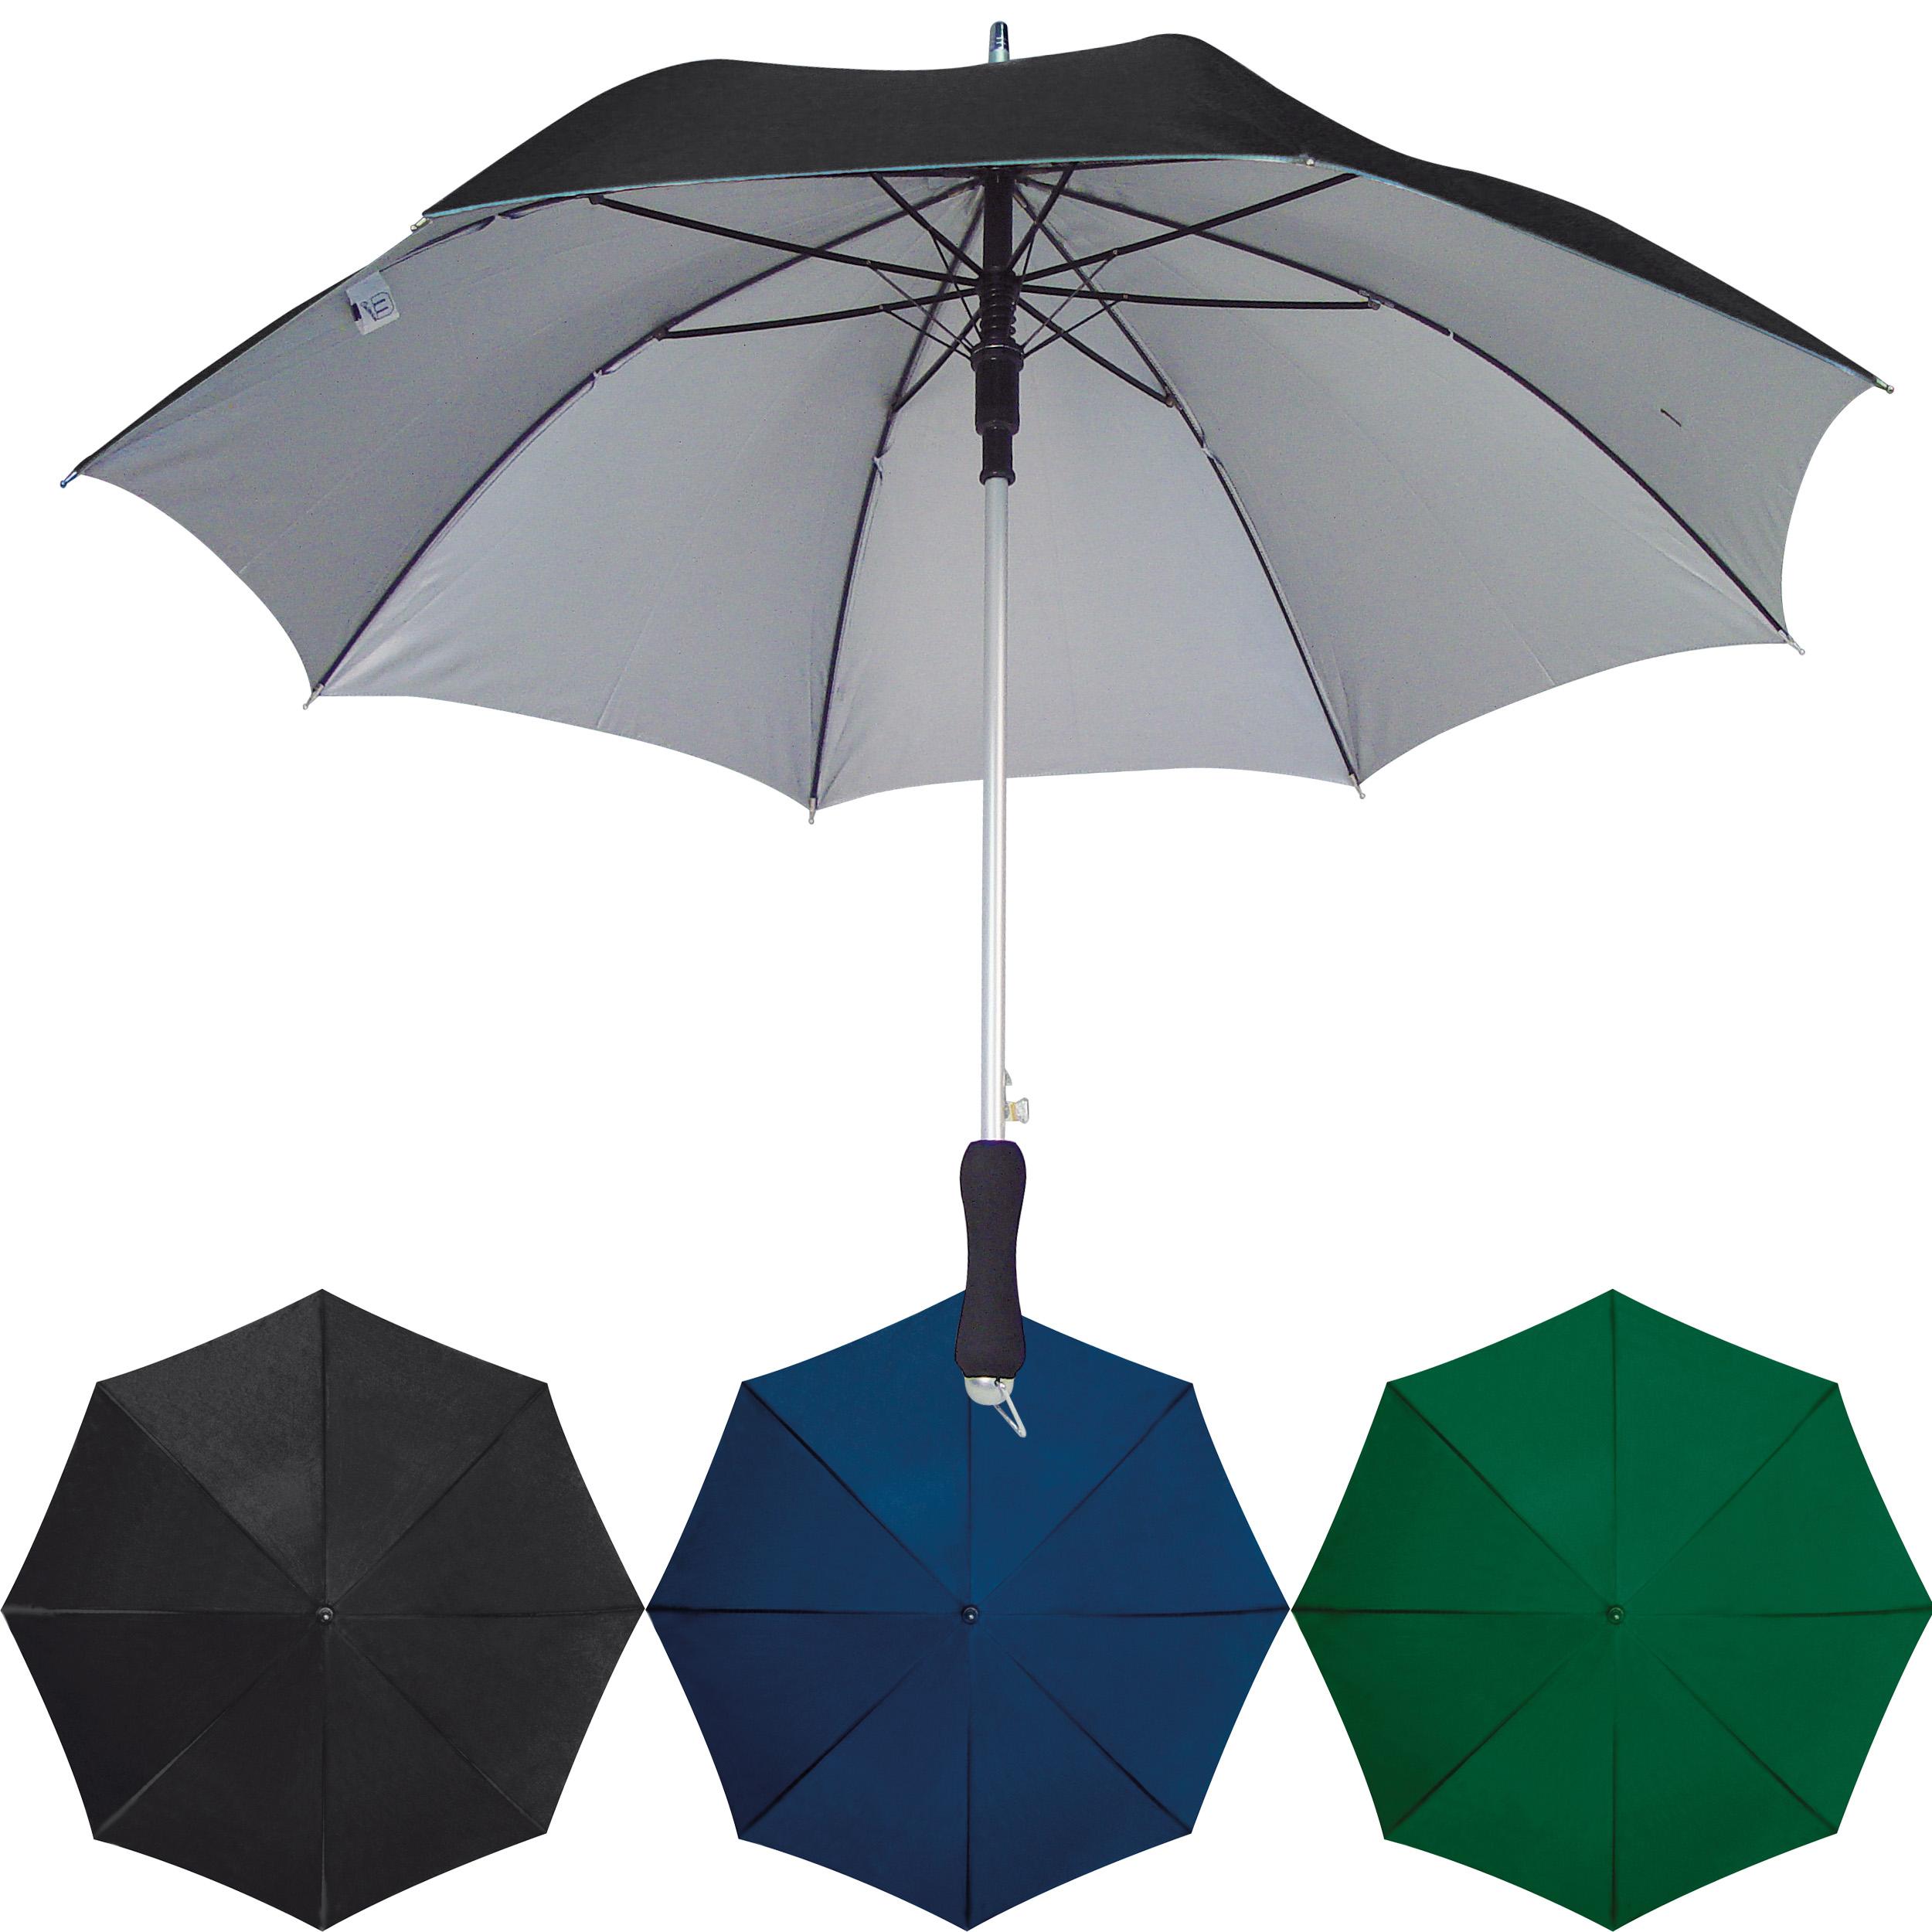 Umbrella with UV protection